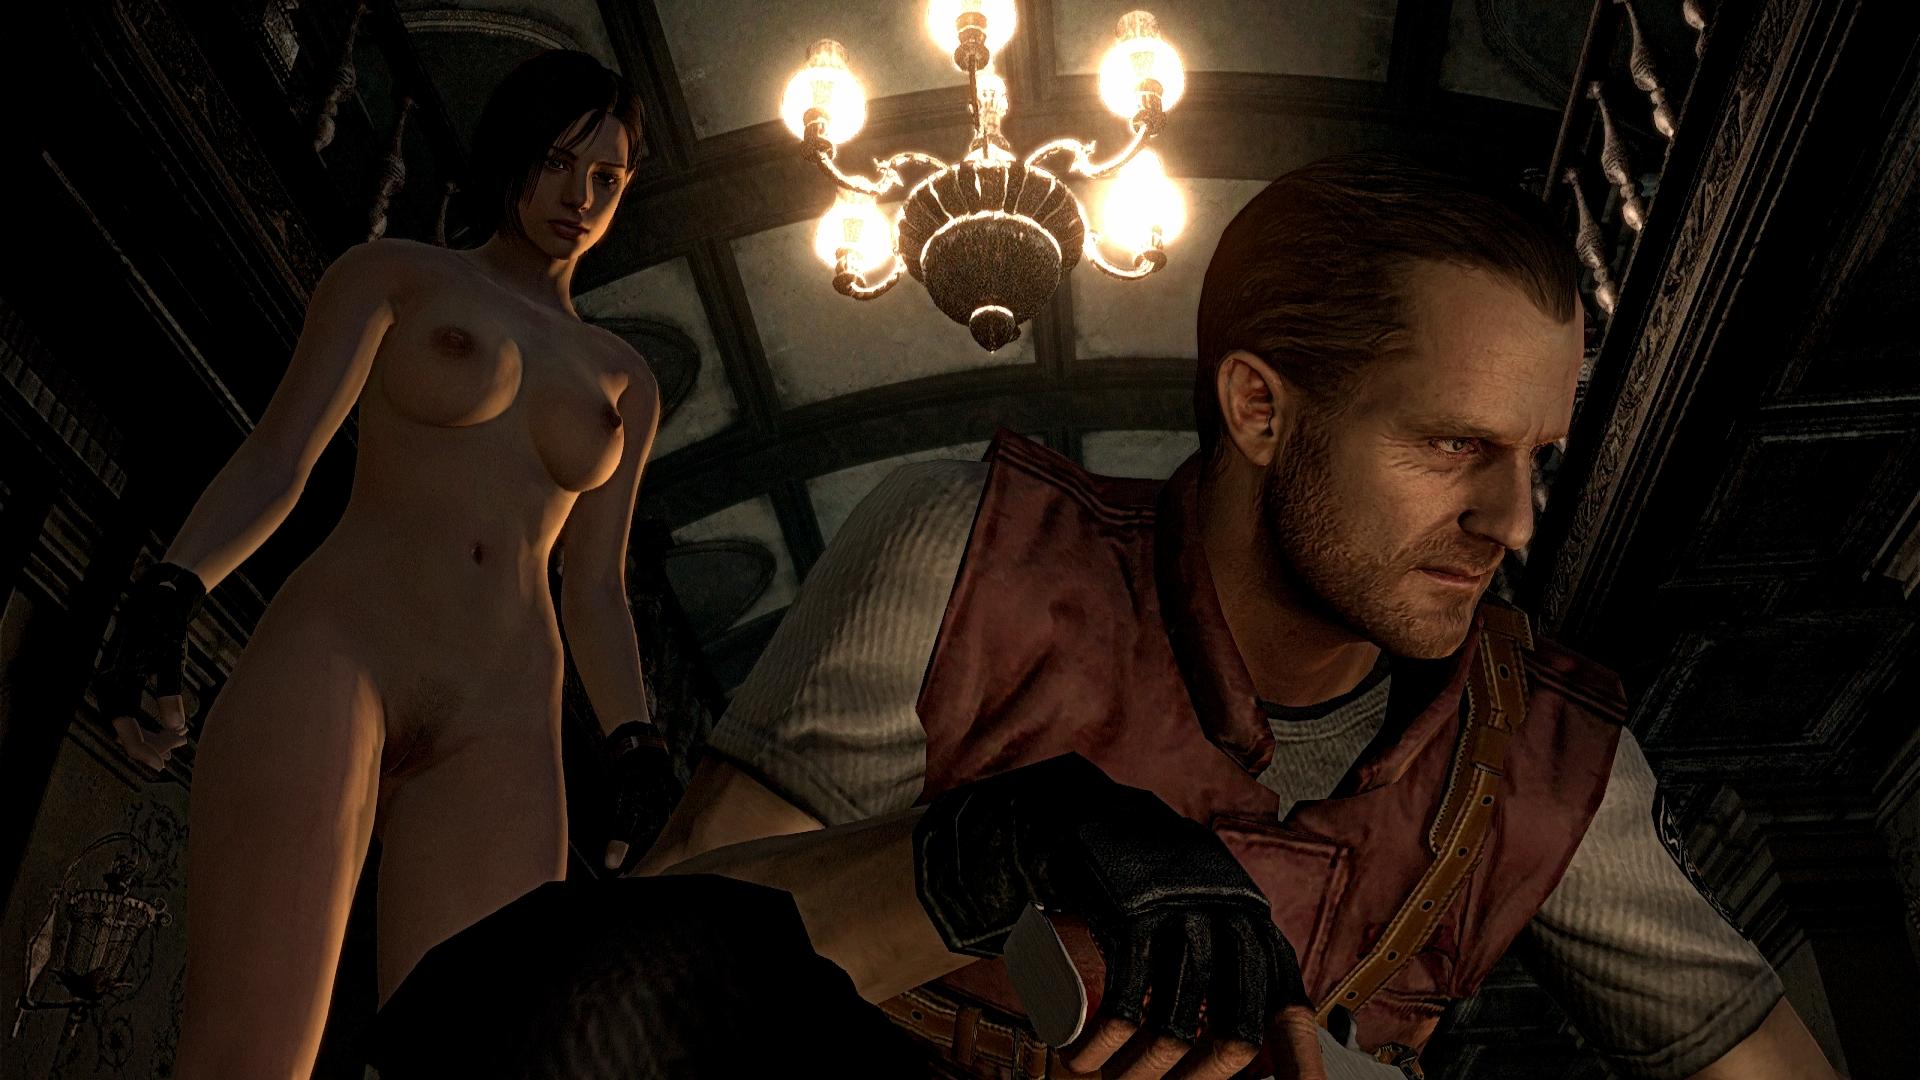 Resident evil 4 ps3 nude mod porn scenes